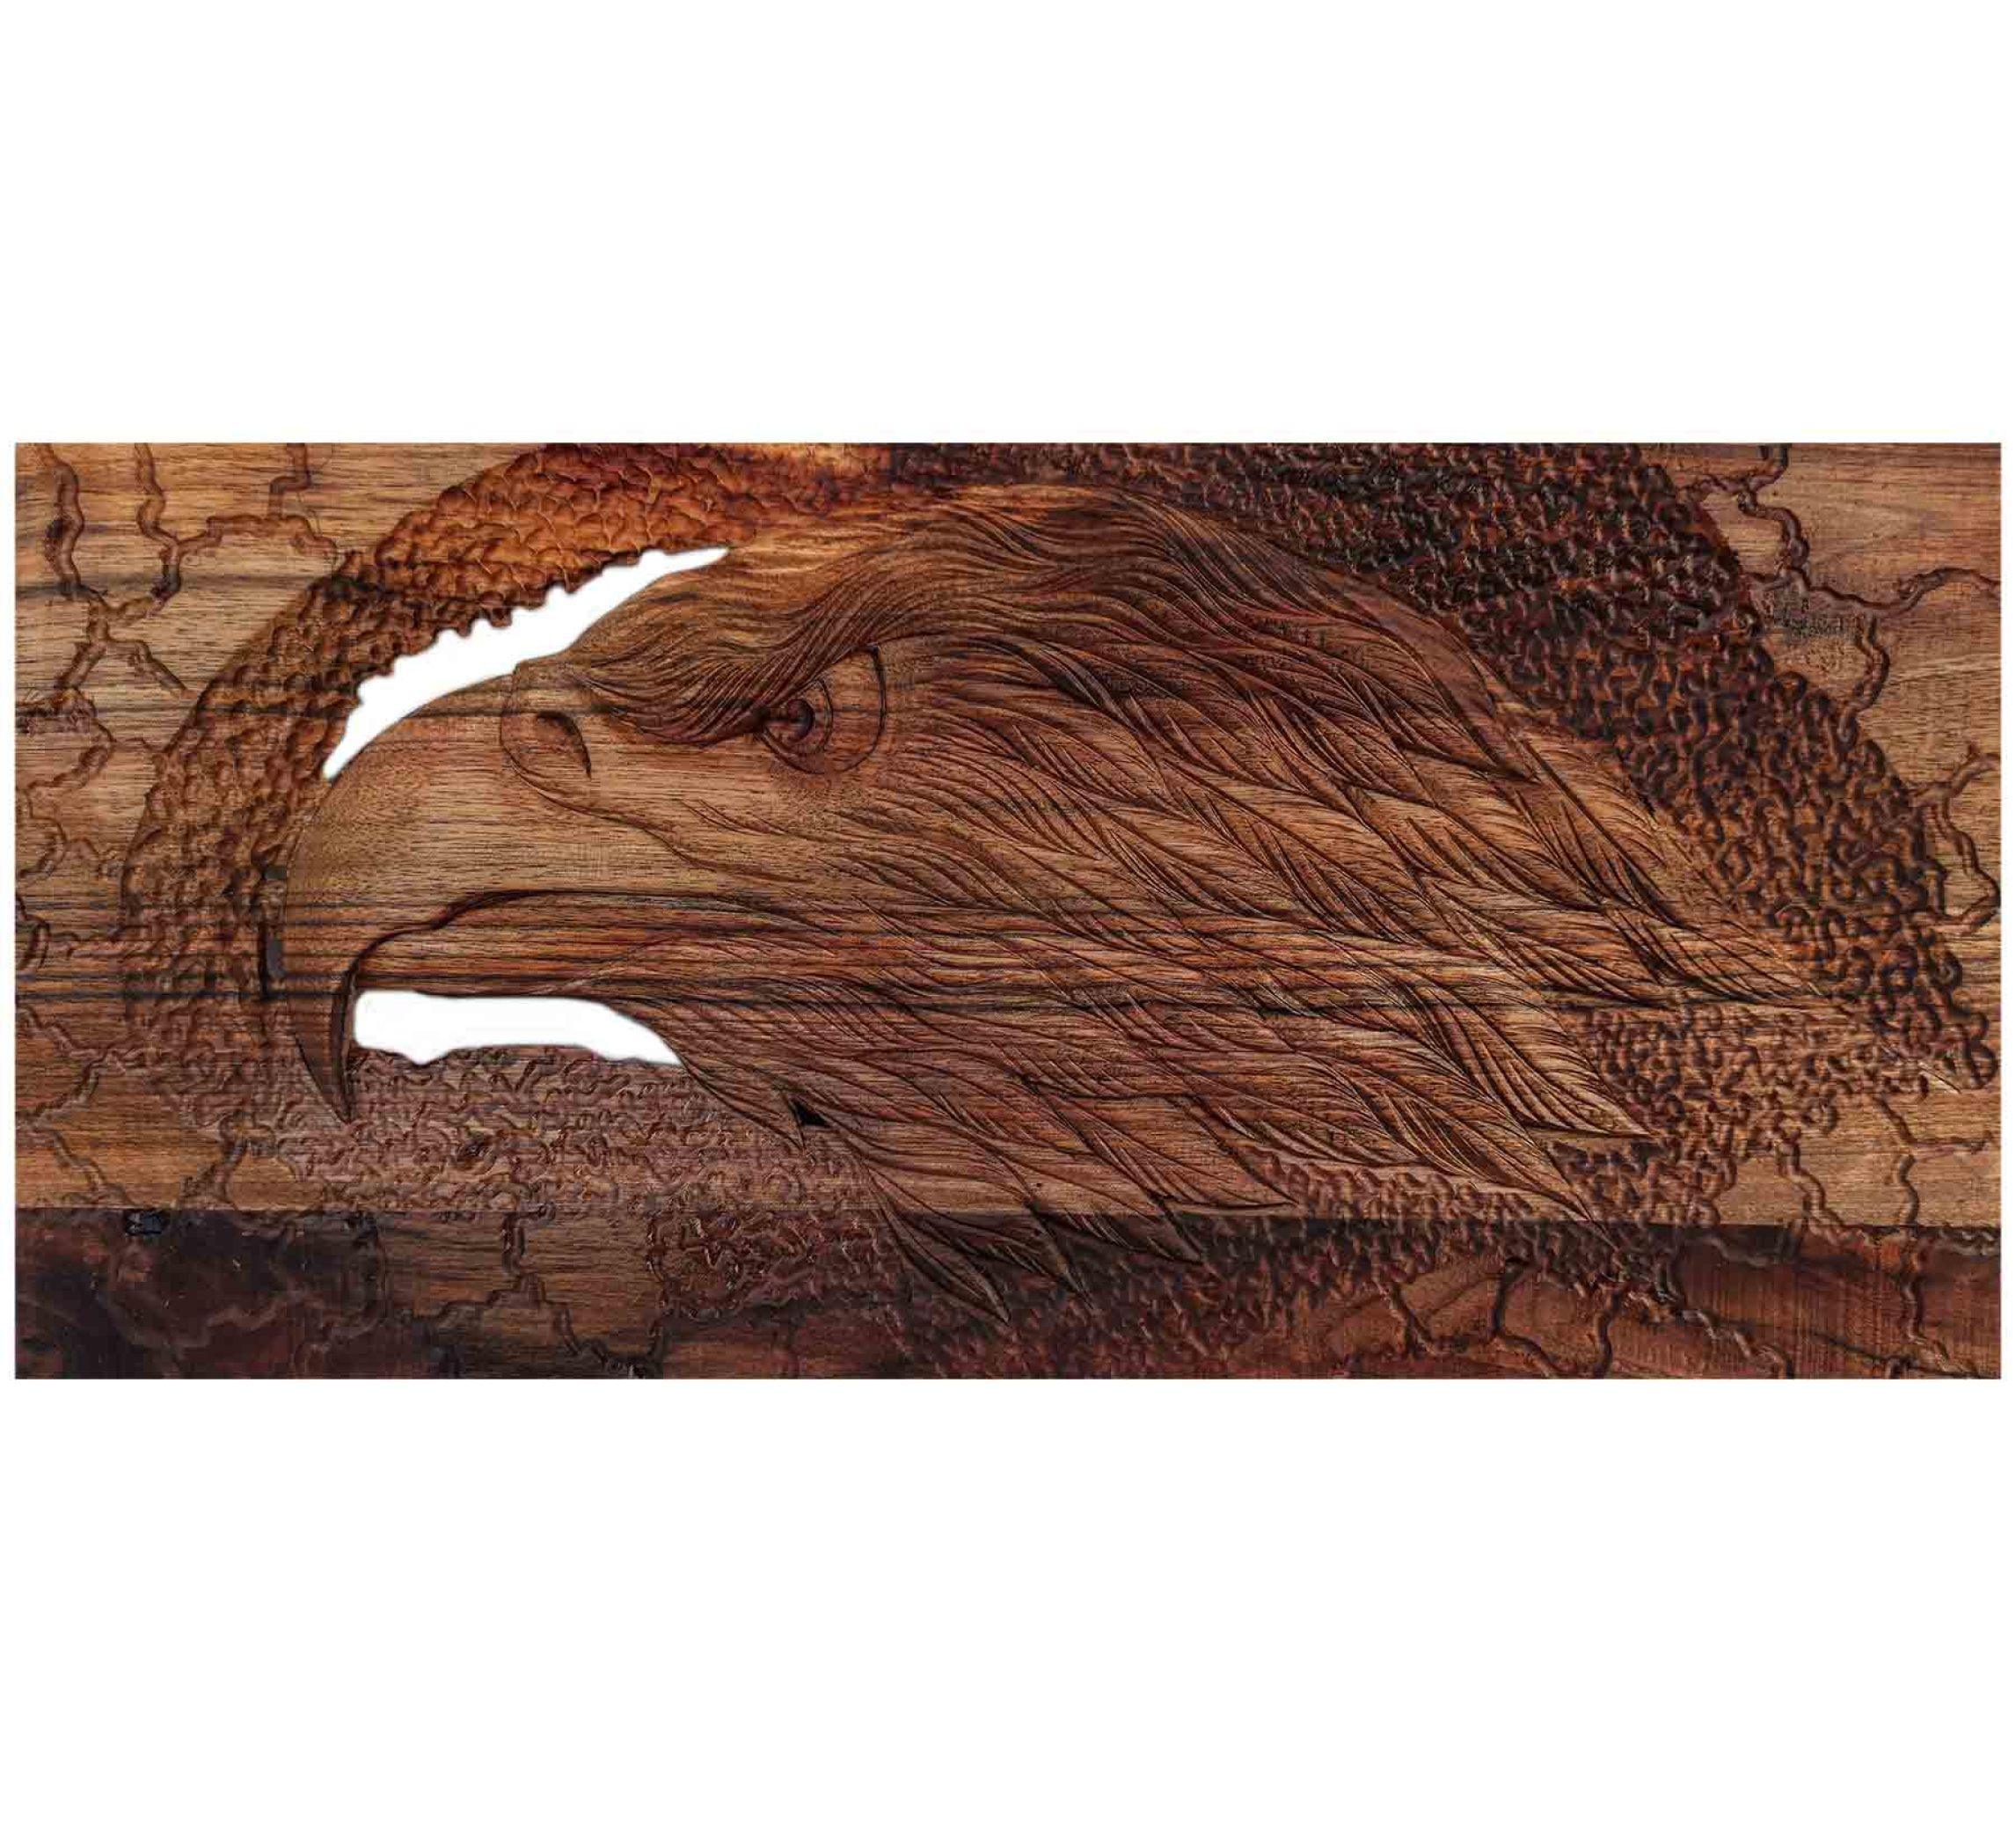 تابلو منبت طرح عقاب روی چوب گردو